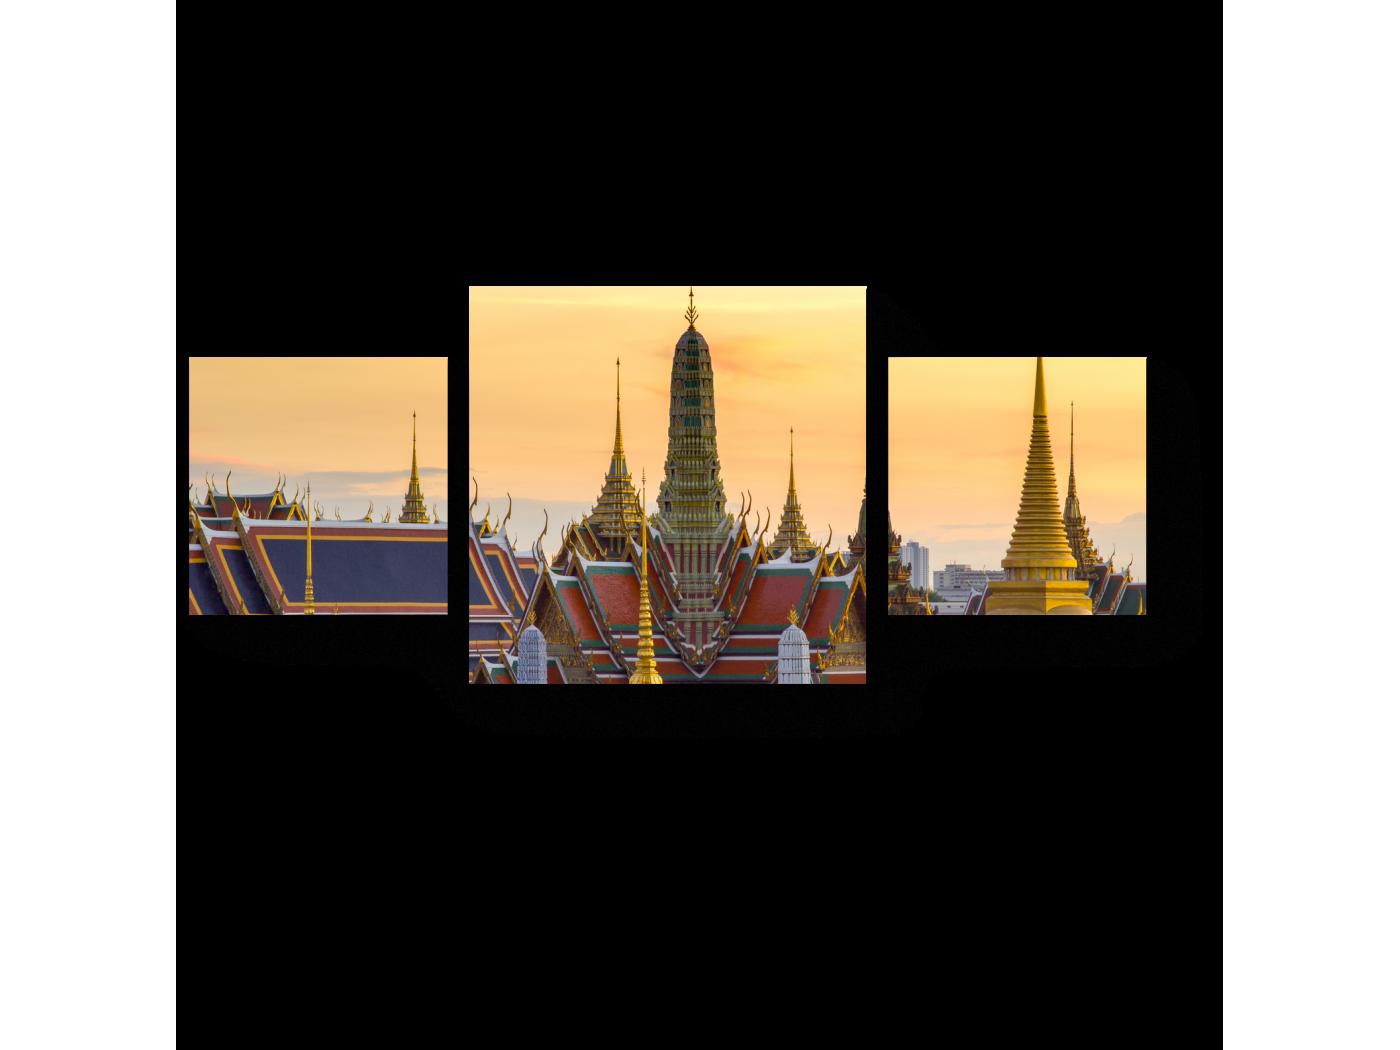 Модульная картина Закат в Банкоке (70x30) фото